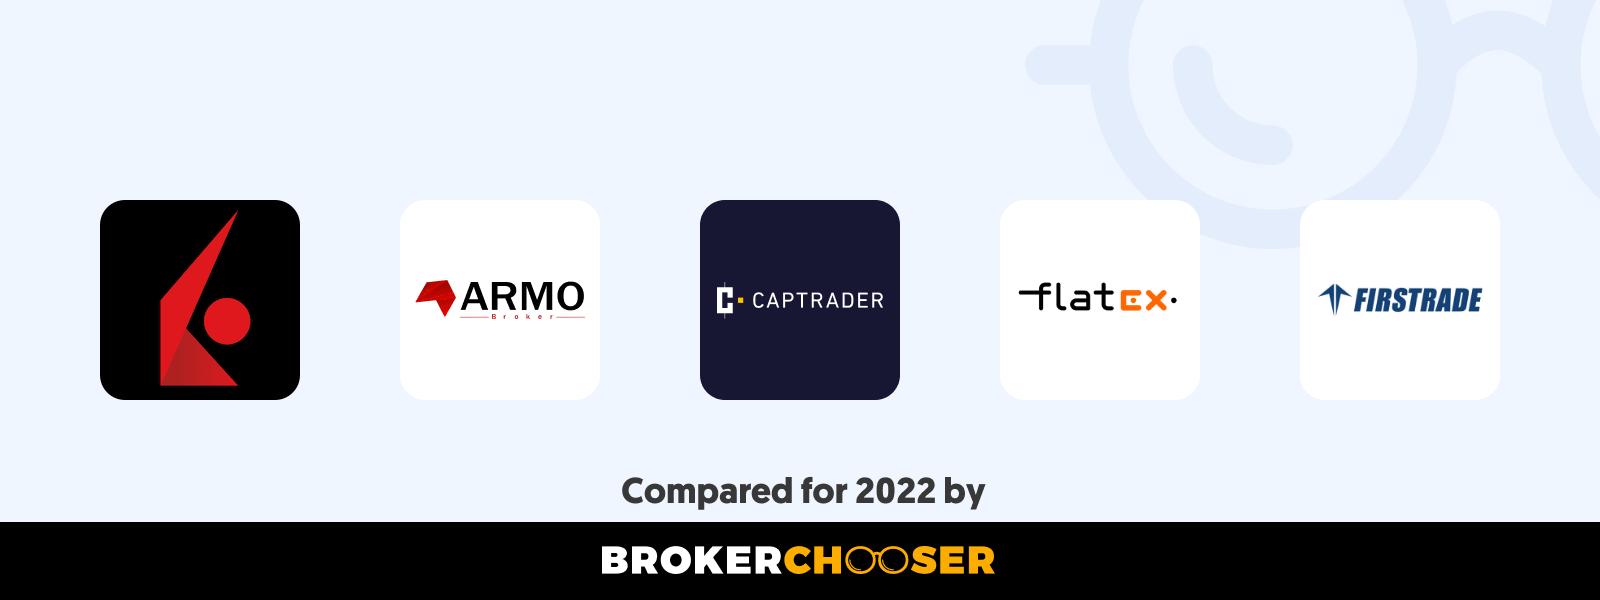 Best brokers for bonds for Europeans